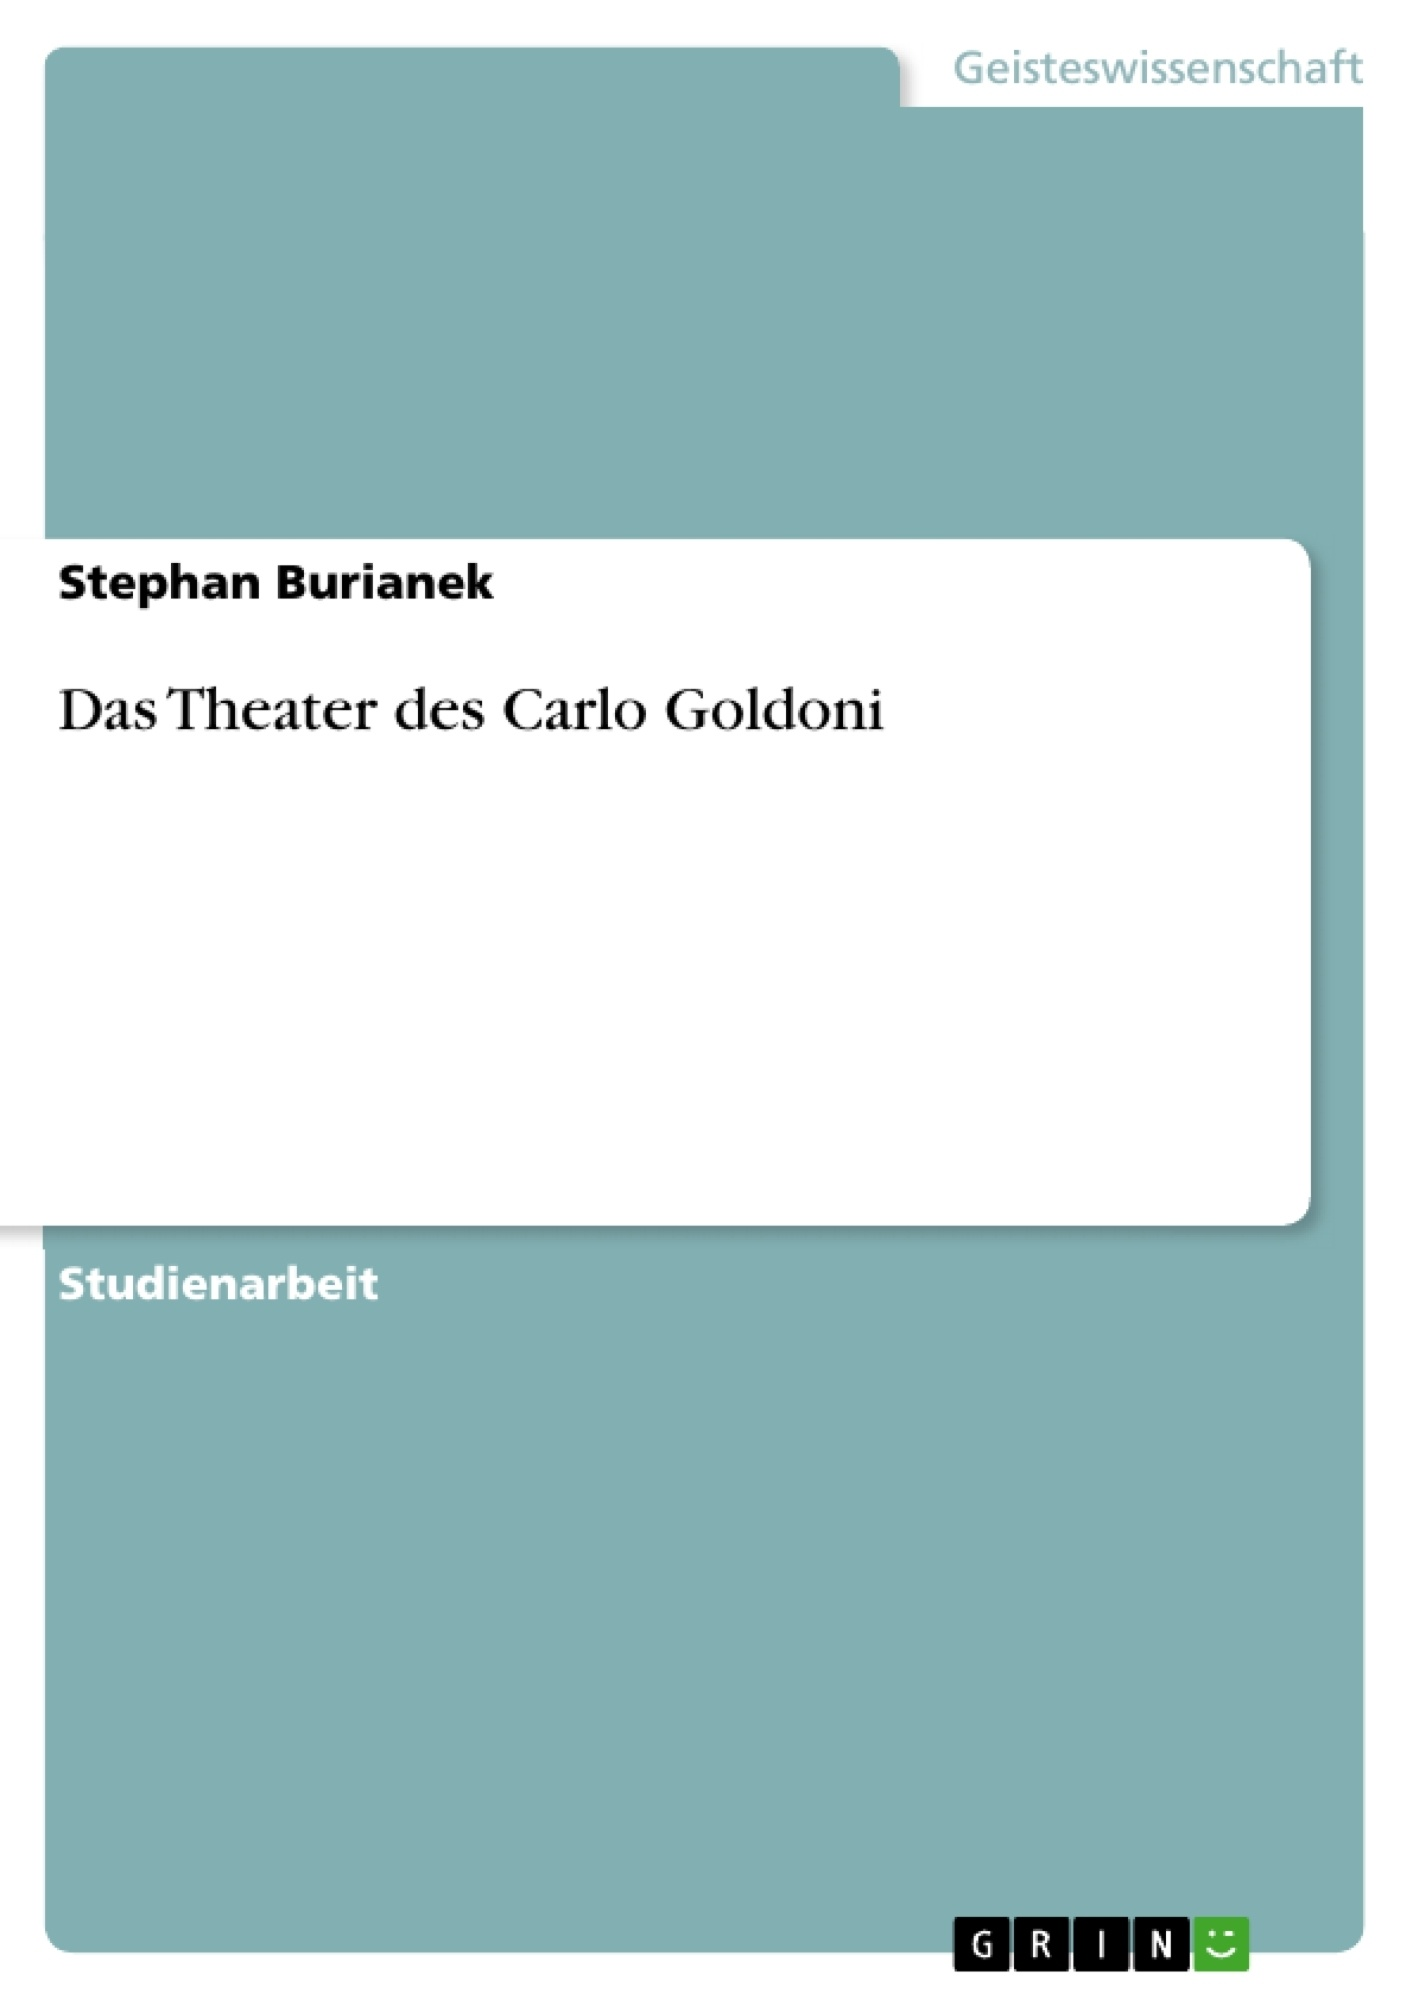 Titel: Das Theater des Carlo Goldoni